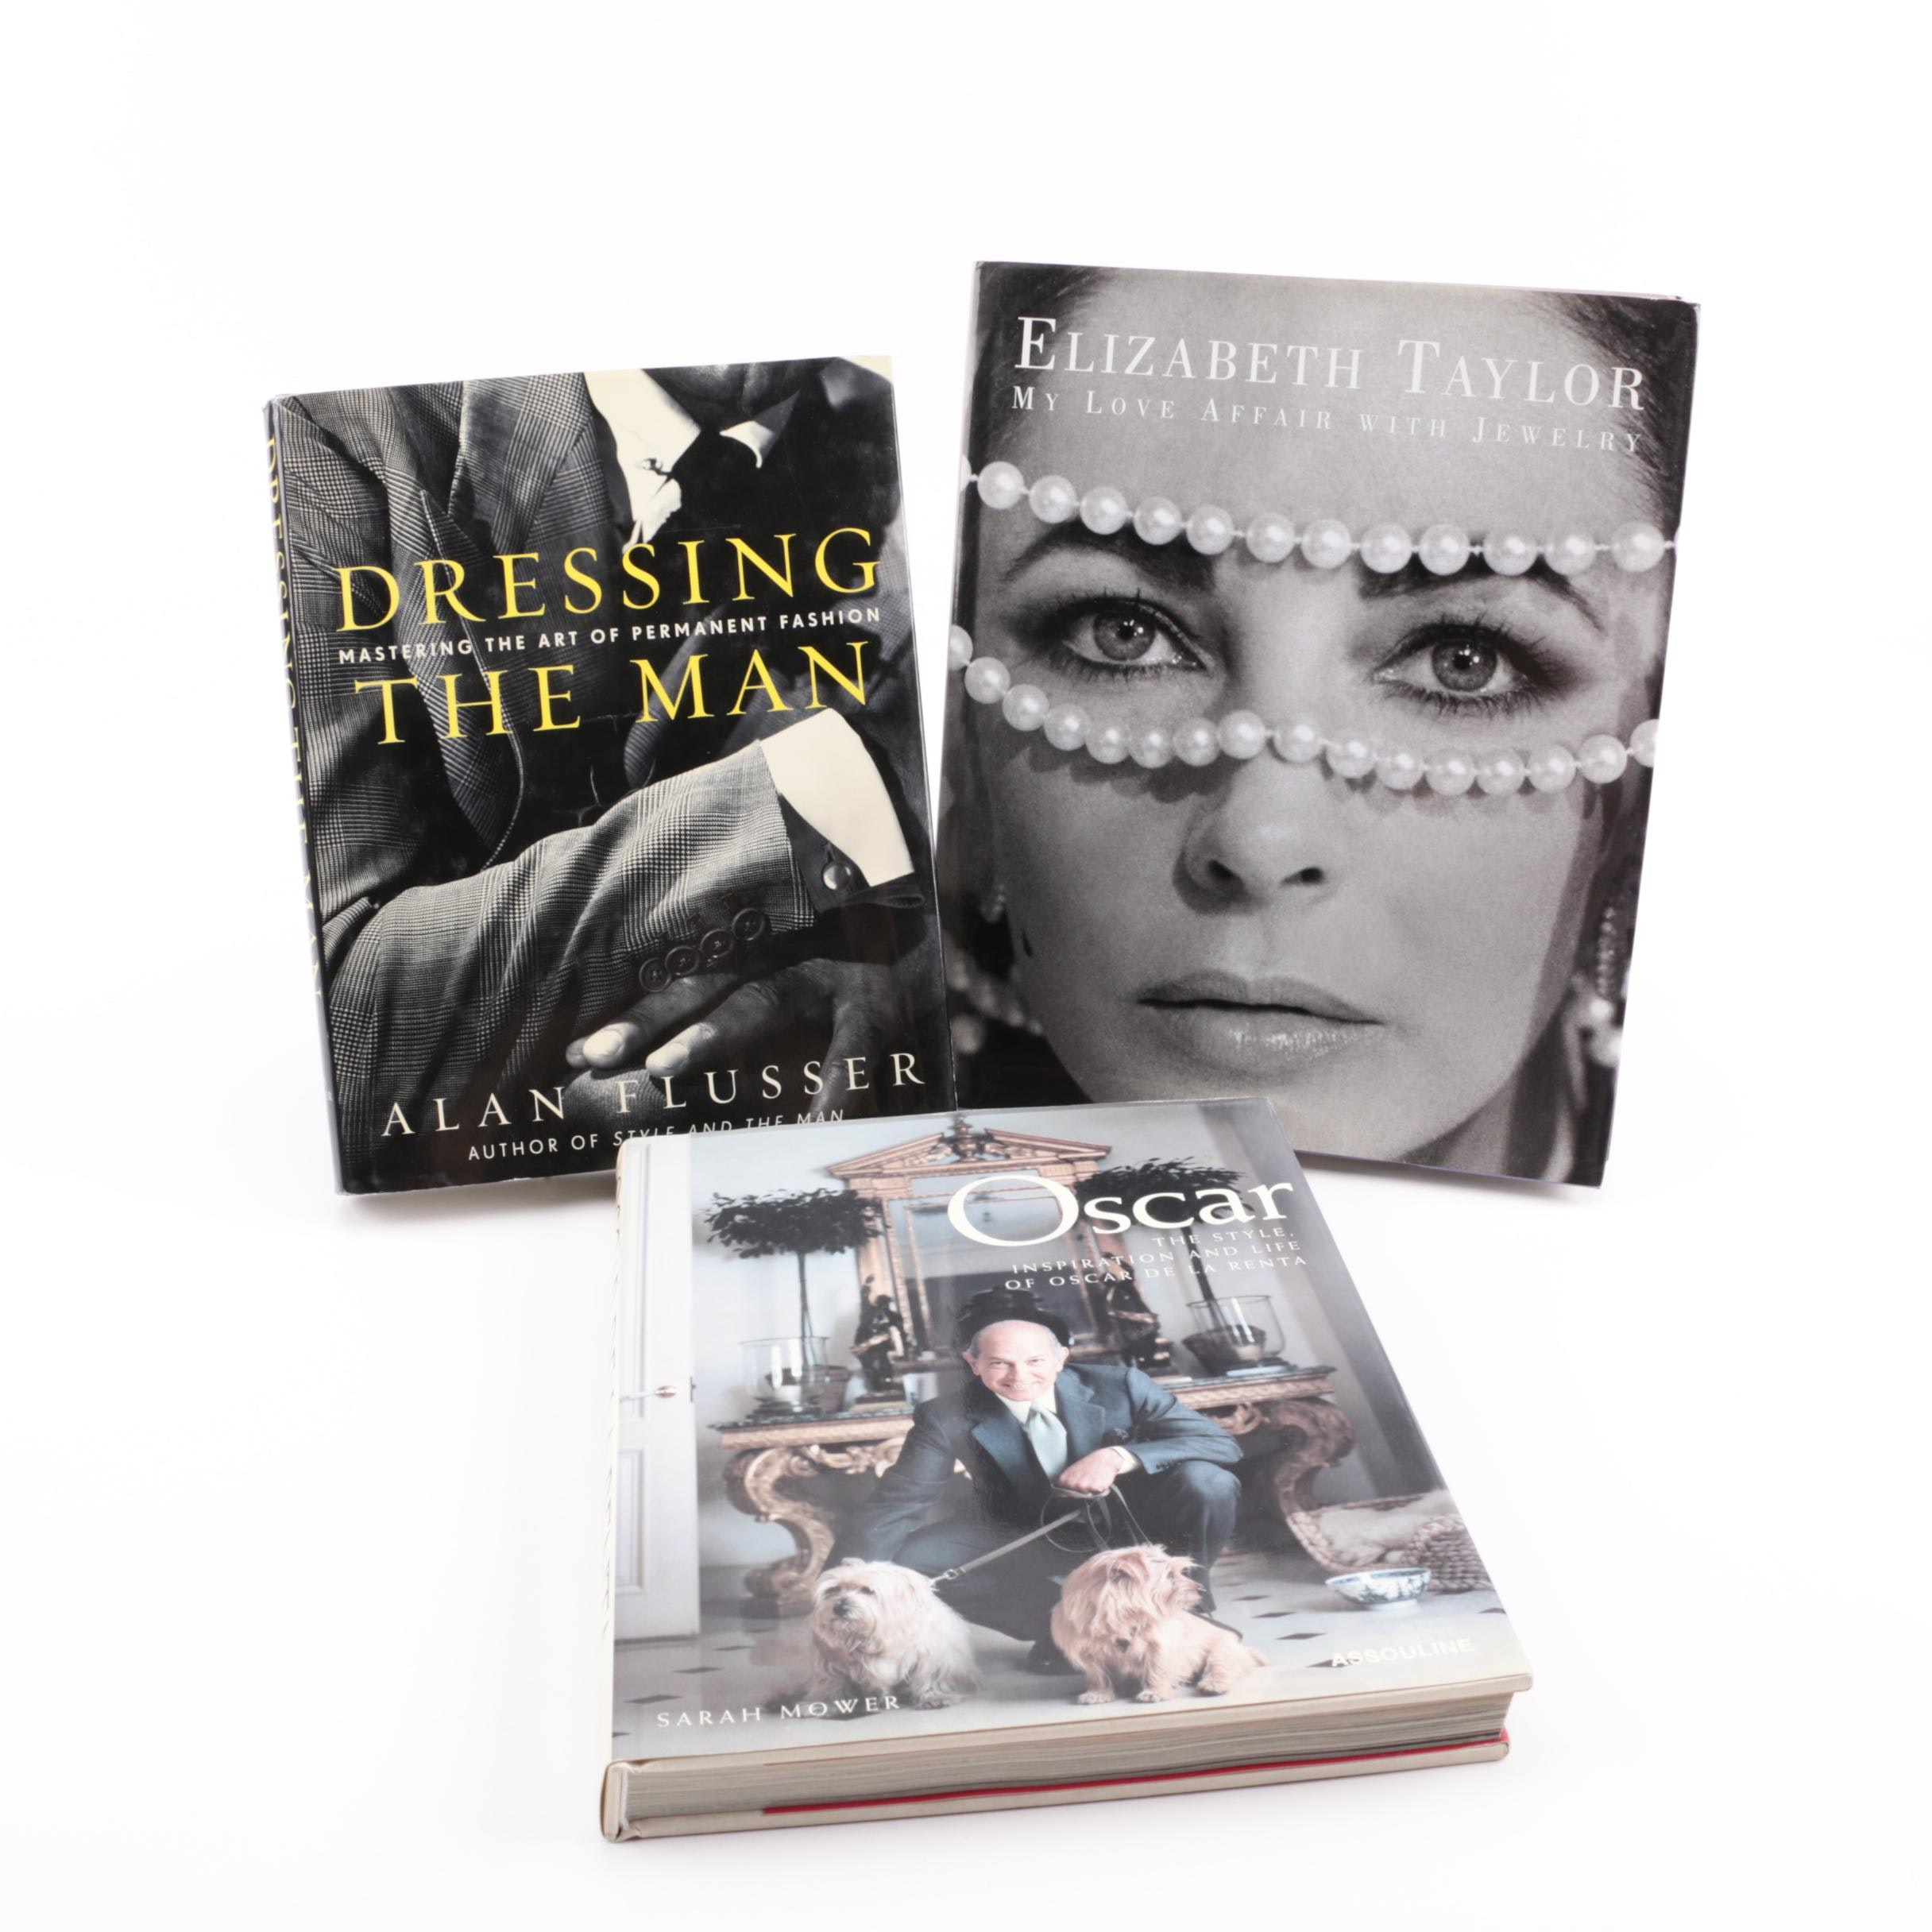 Fashion Books including Elizabeth Taylor and Oscar de la Renta